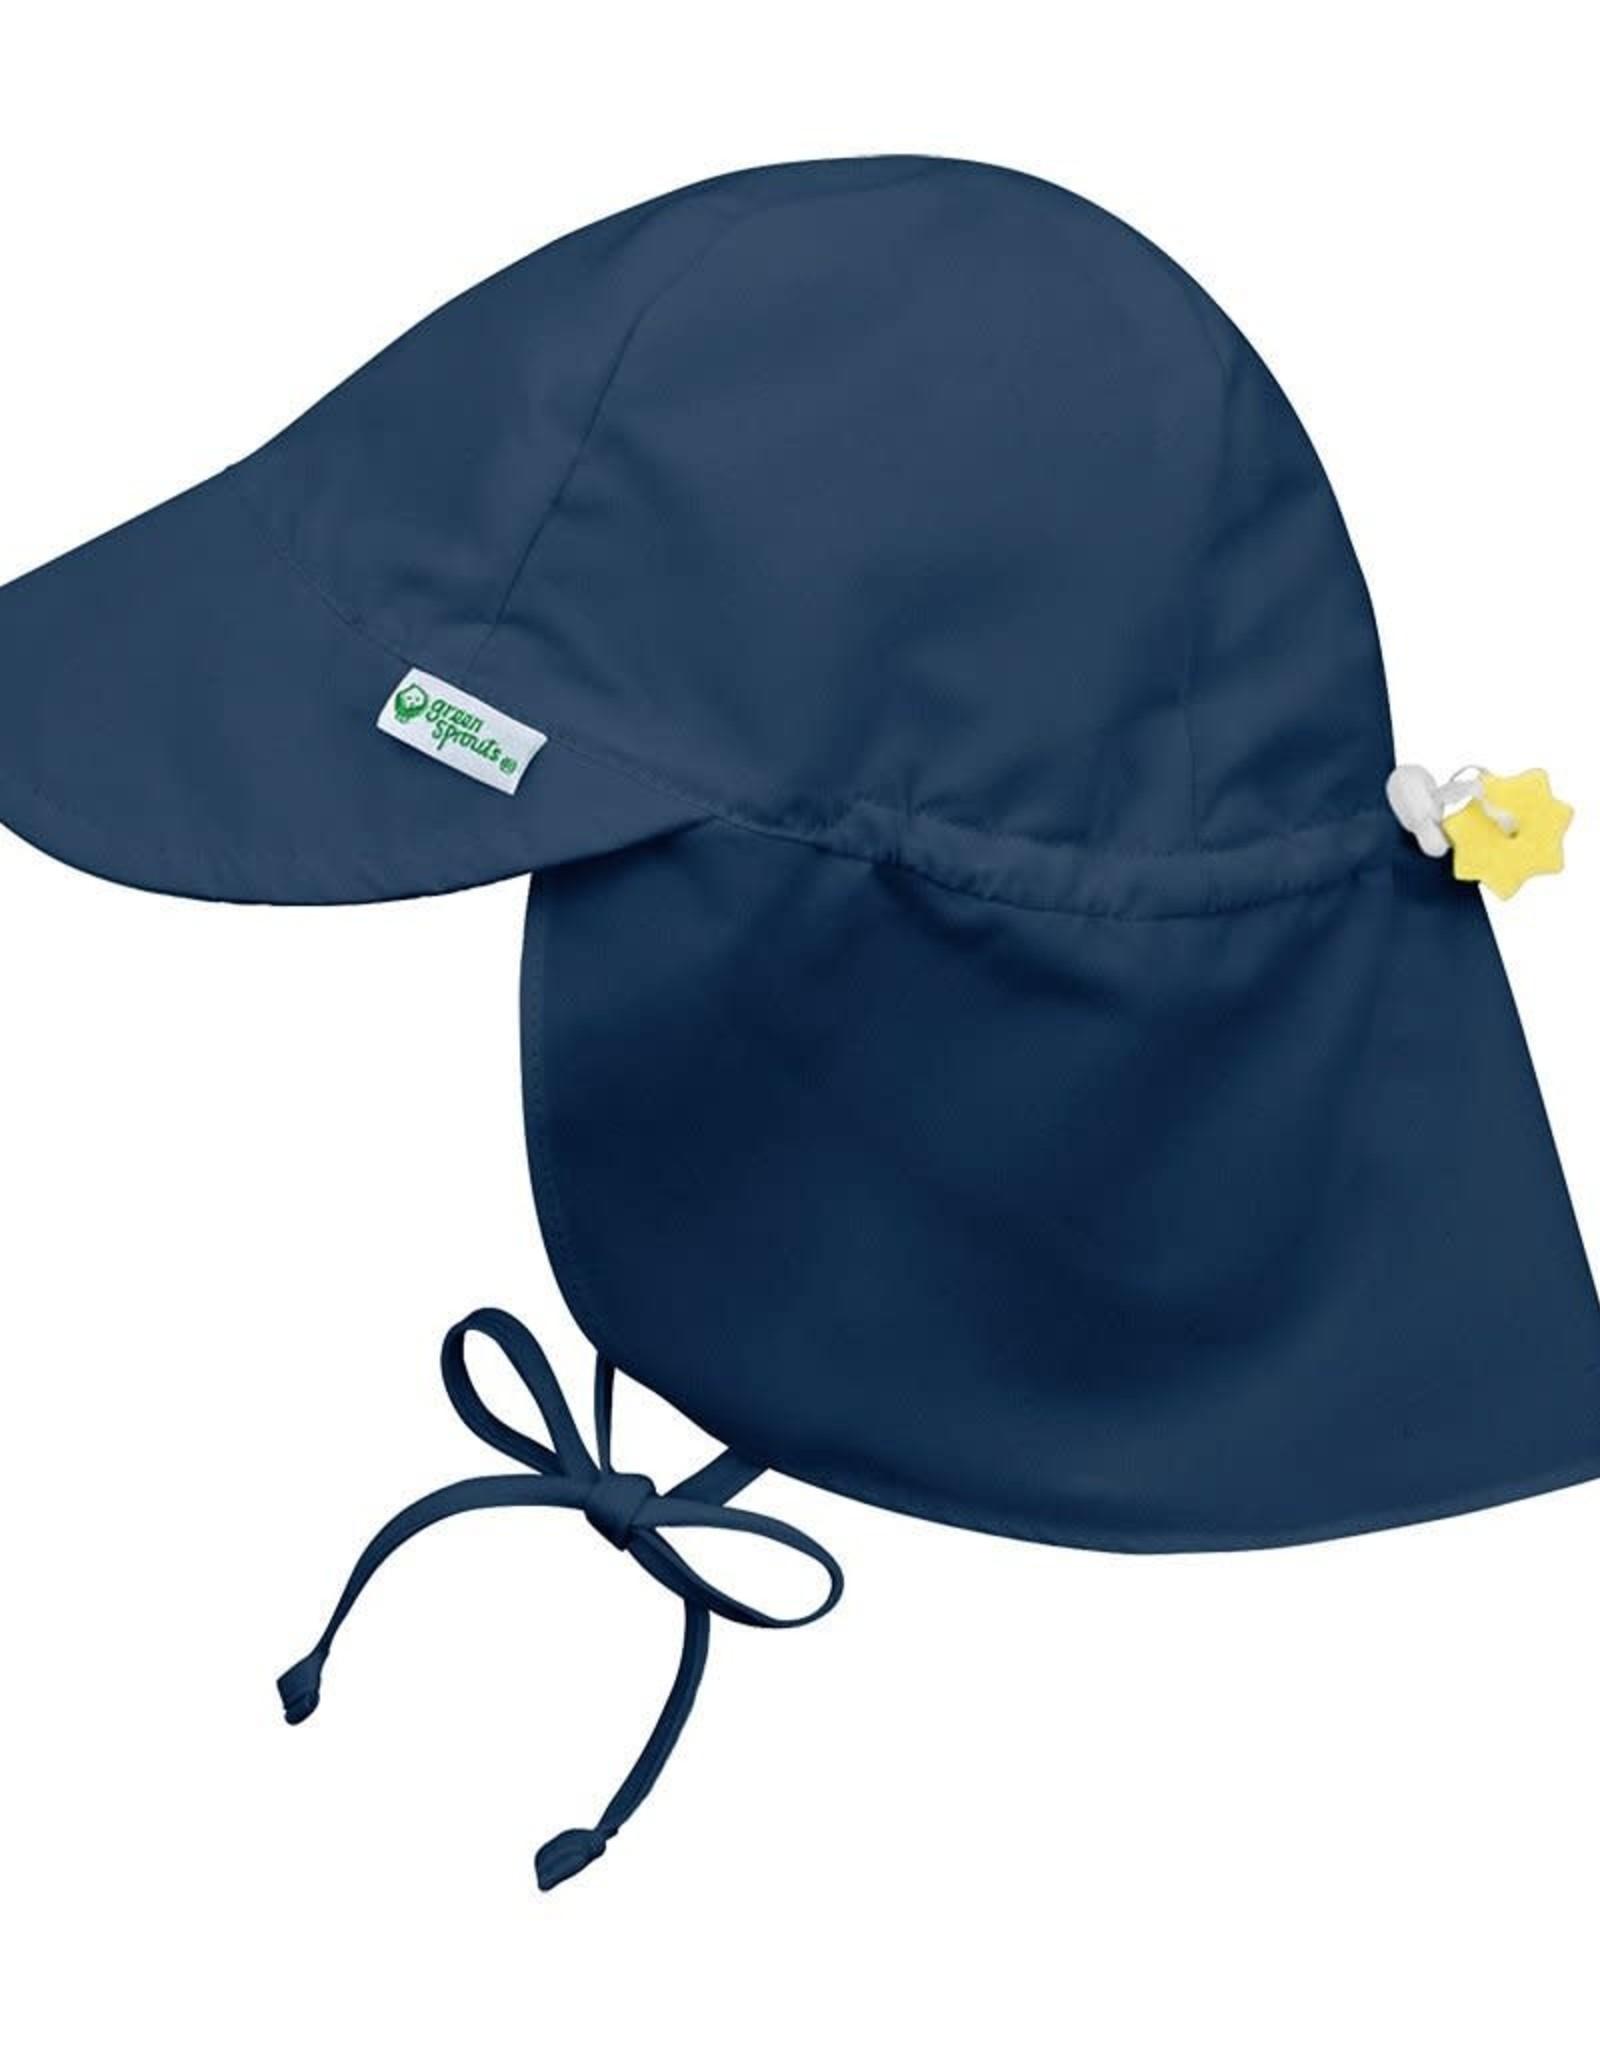 Flap Sun Protection Hat Navy Blue